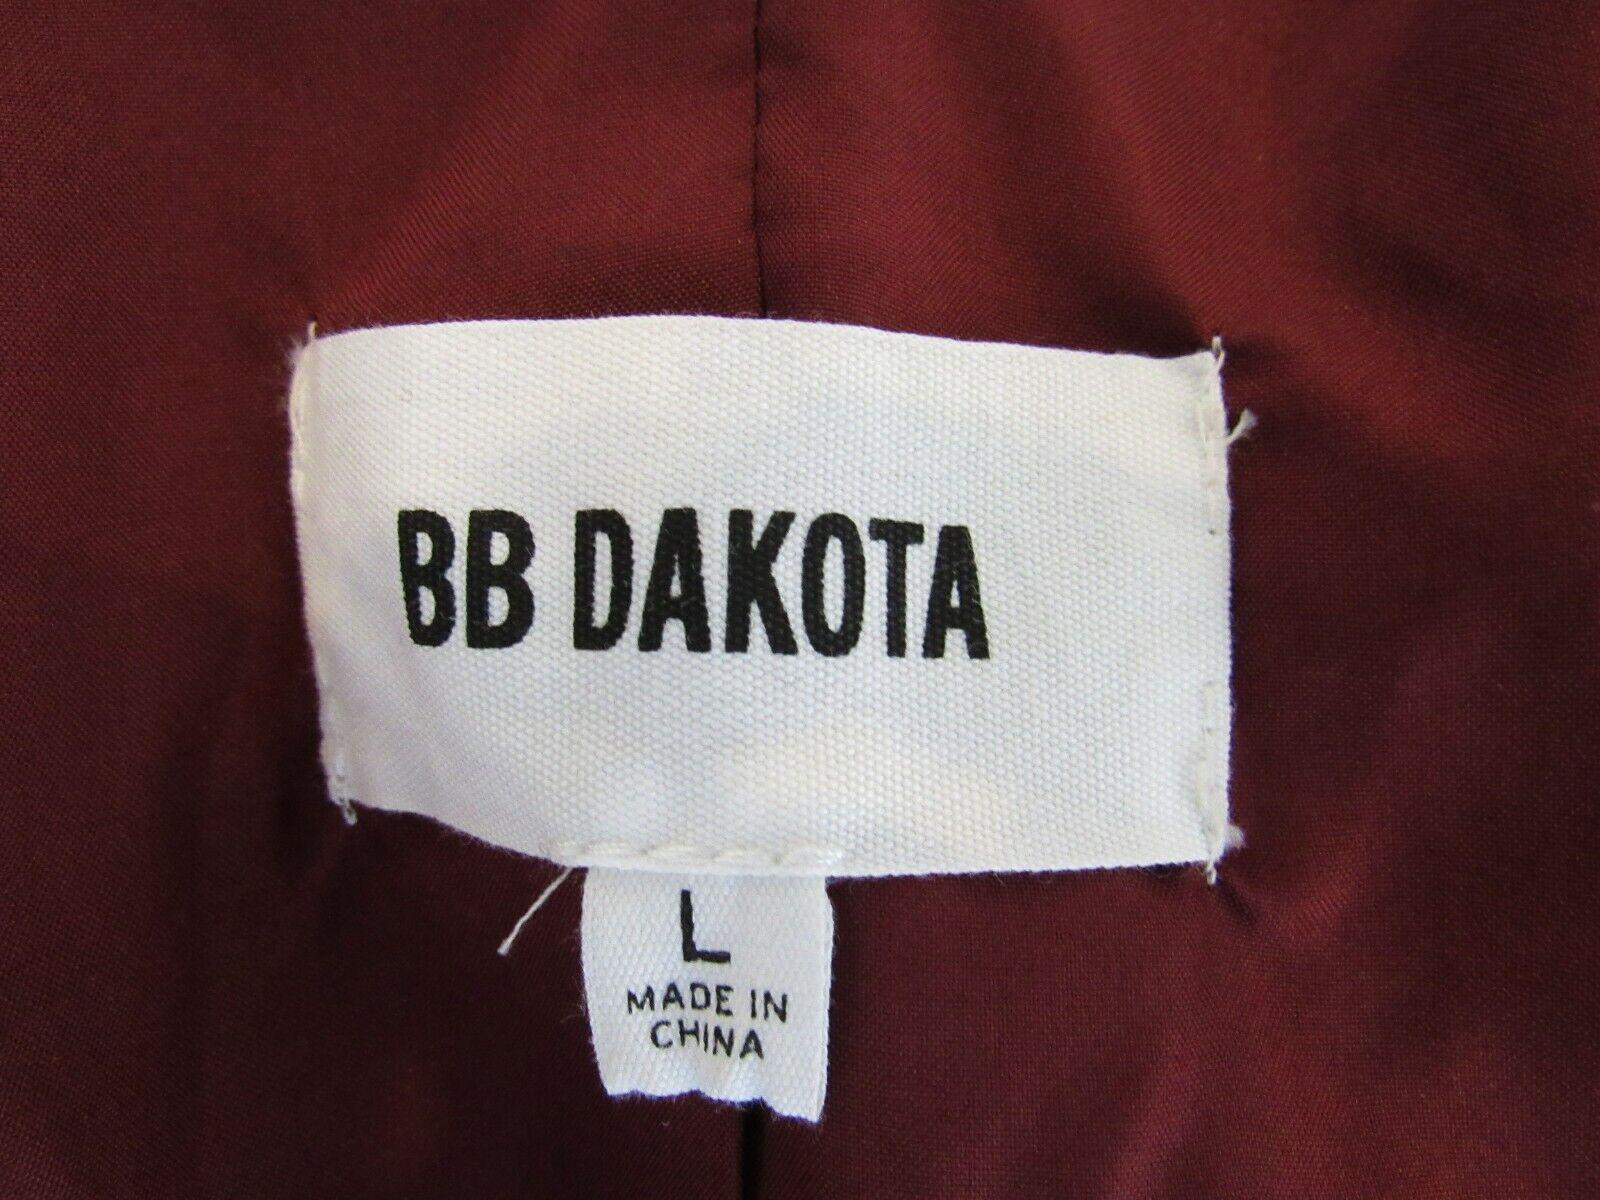 BB Dakota Red Velvet Jacket Blazer Size Large - image 8